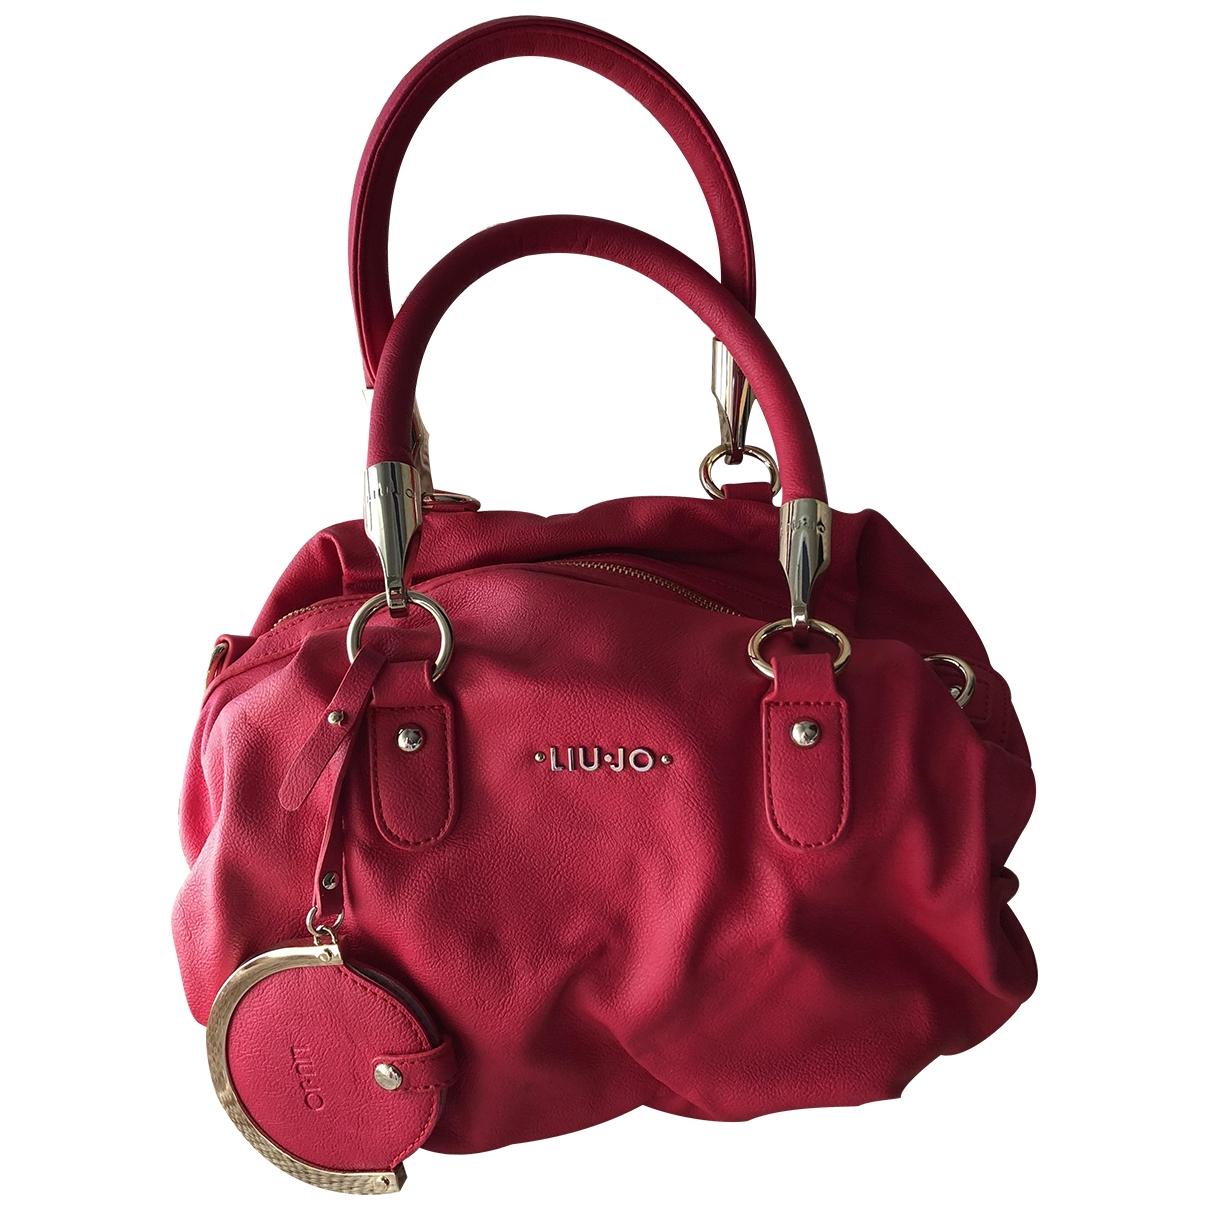 Liu.jo \N Red handbag for Women \N